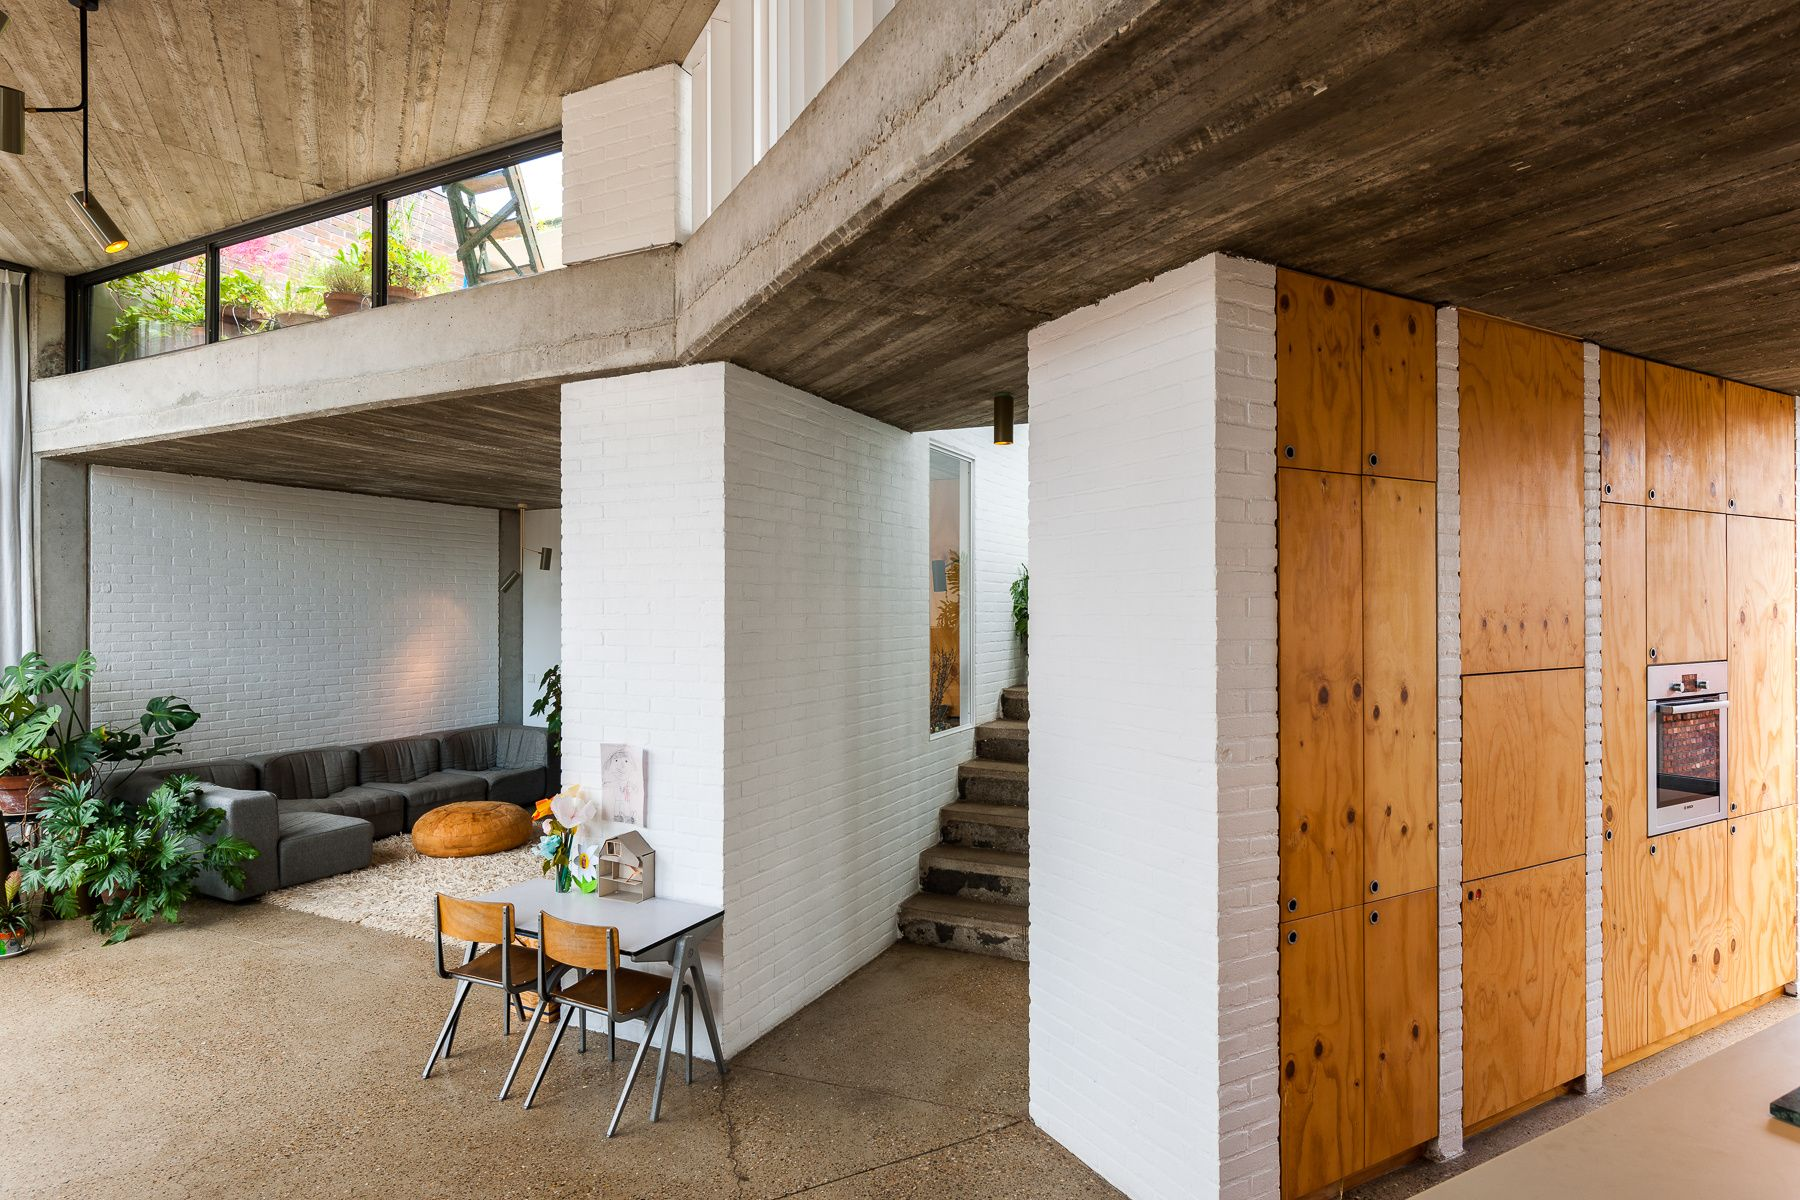 Luc Roymans interior design architecture photography